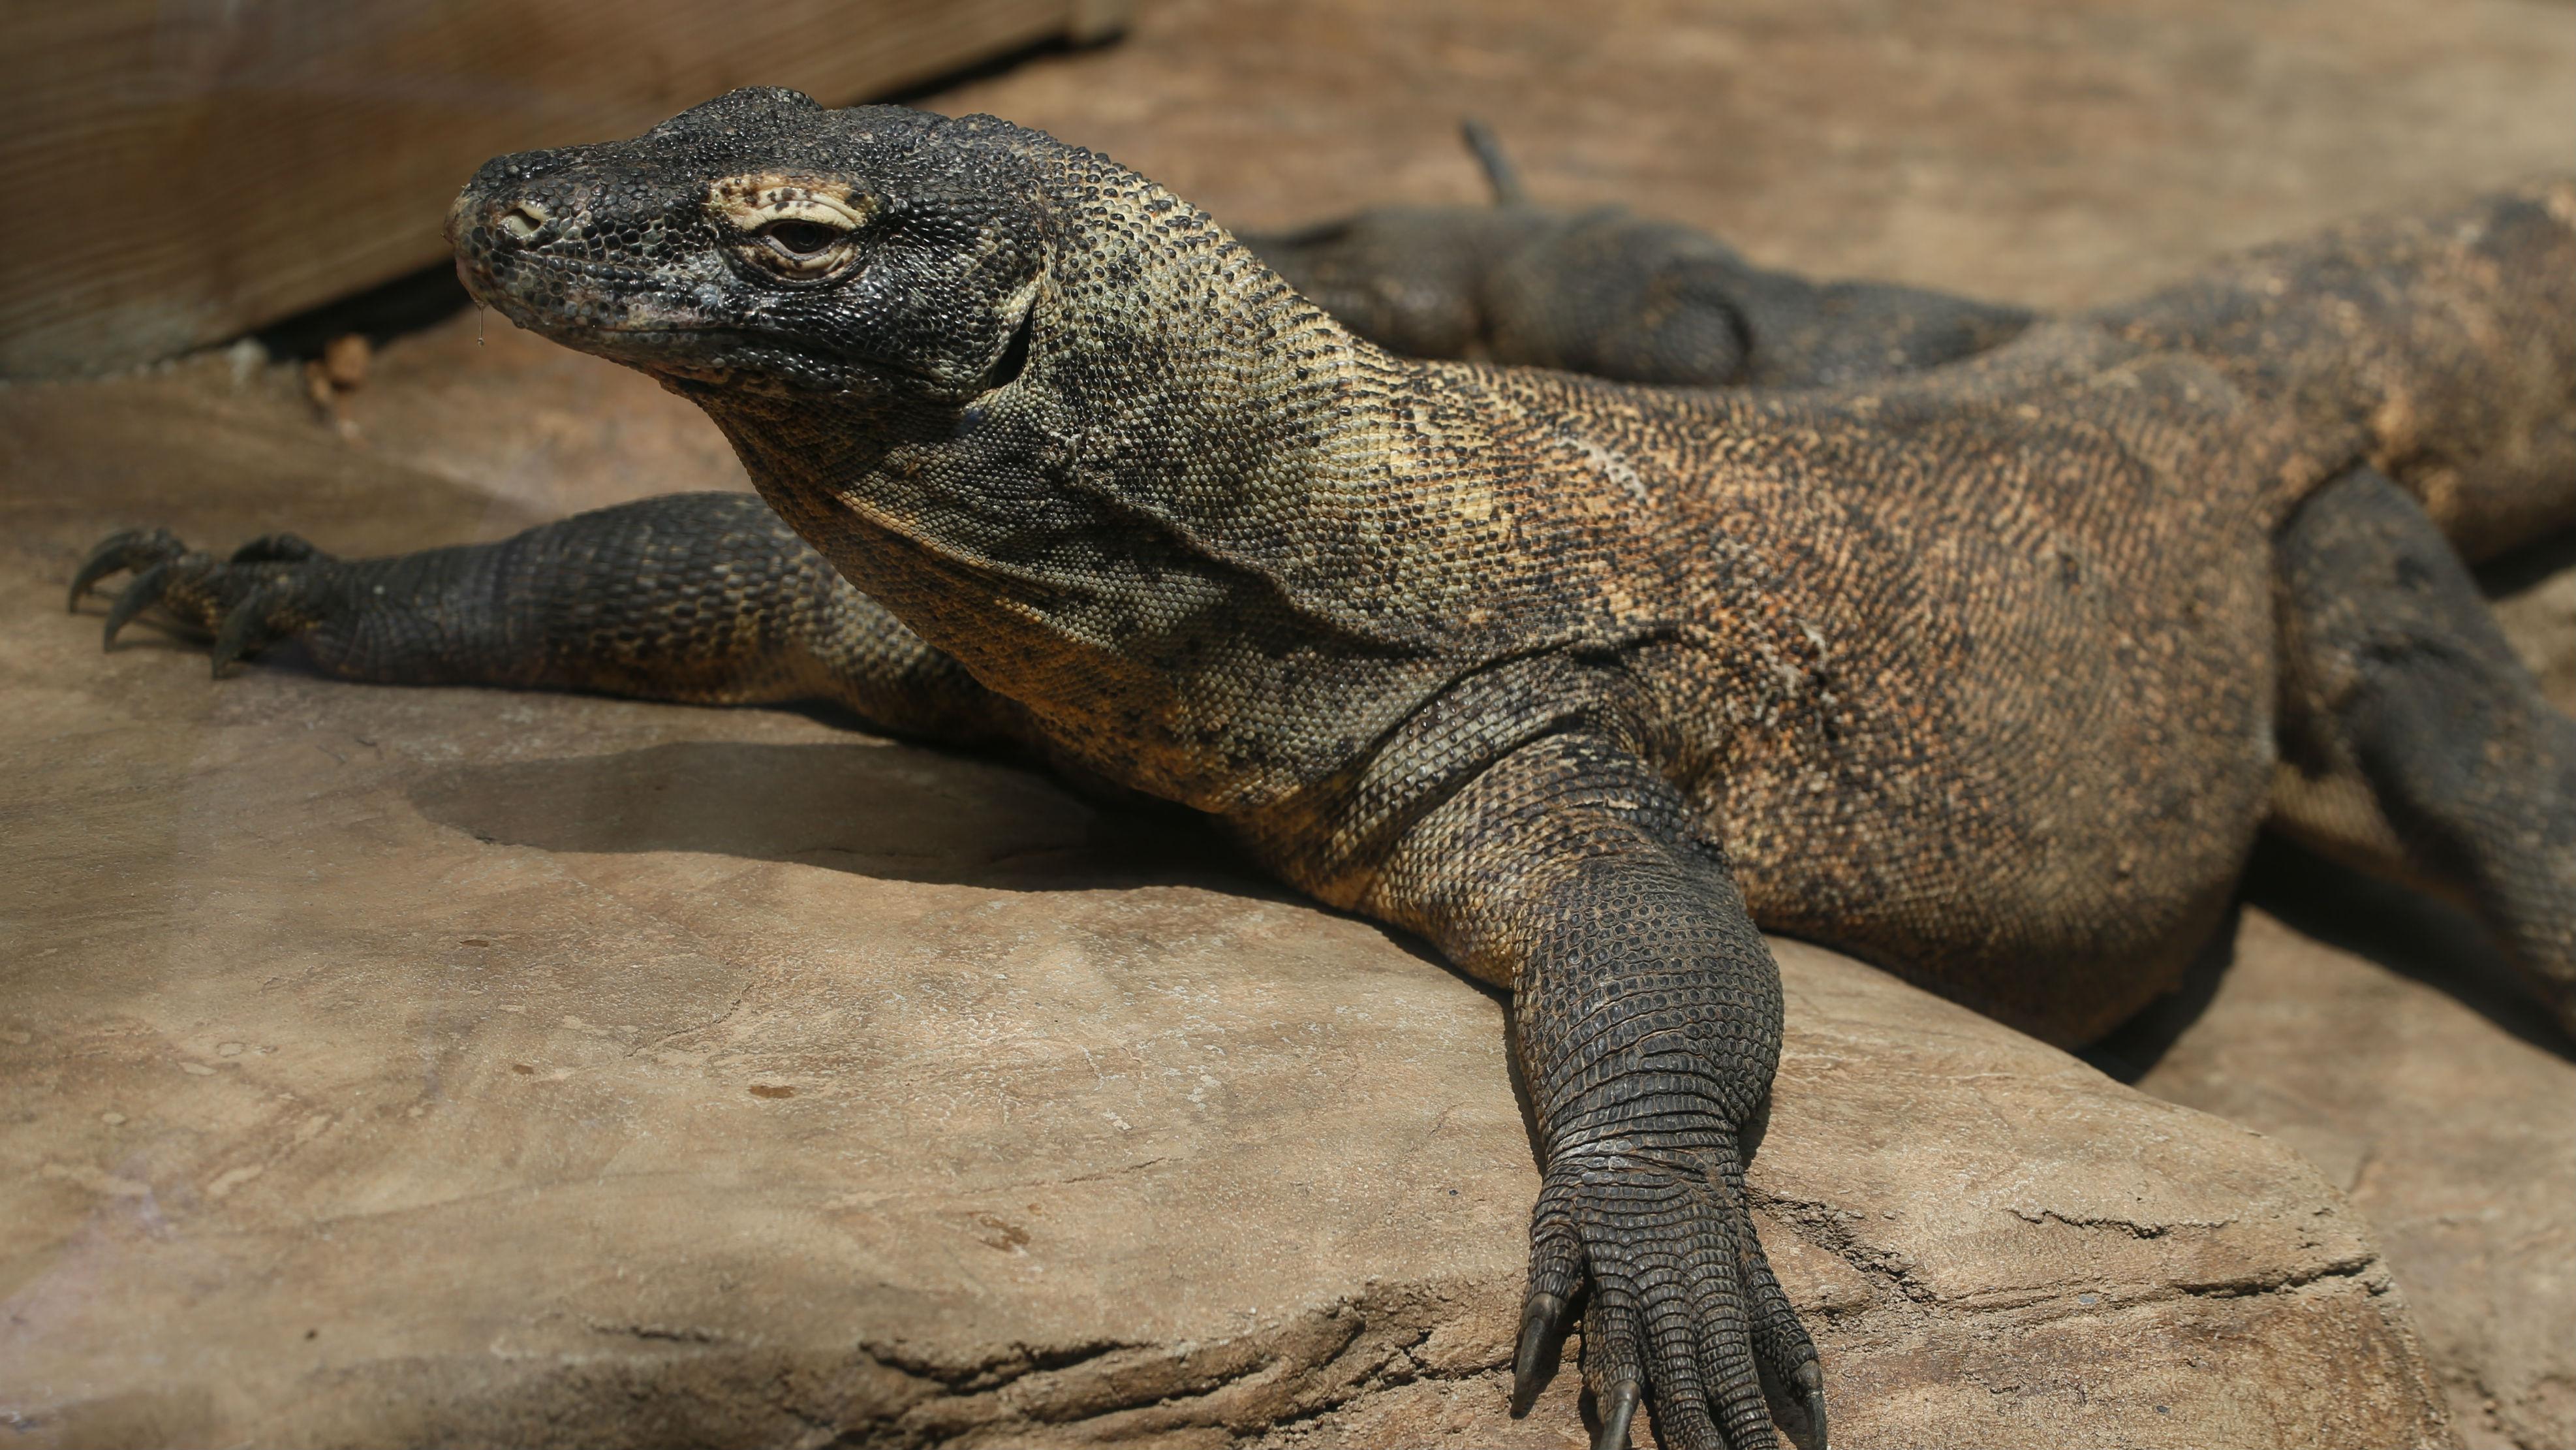 A komodo dragon on a rock.